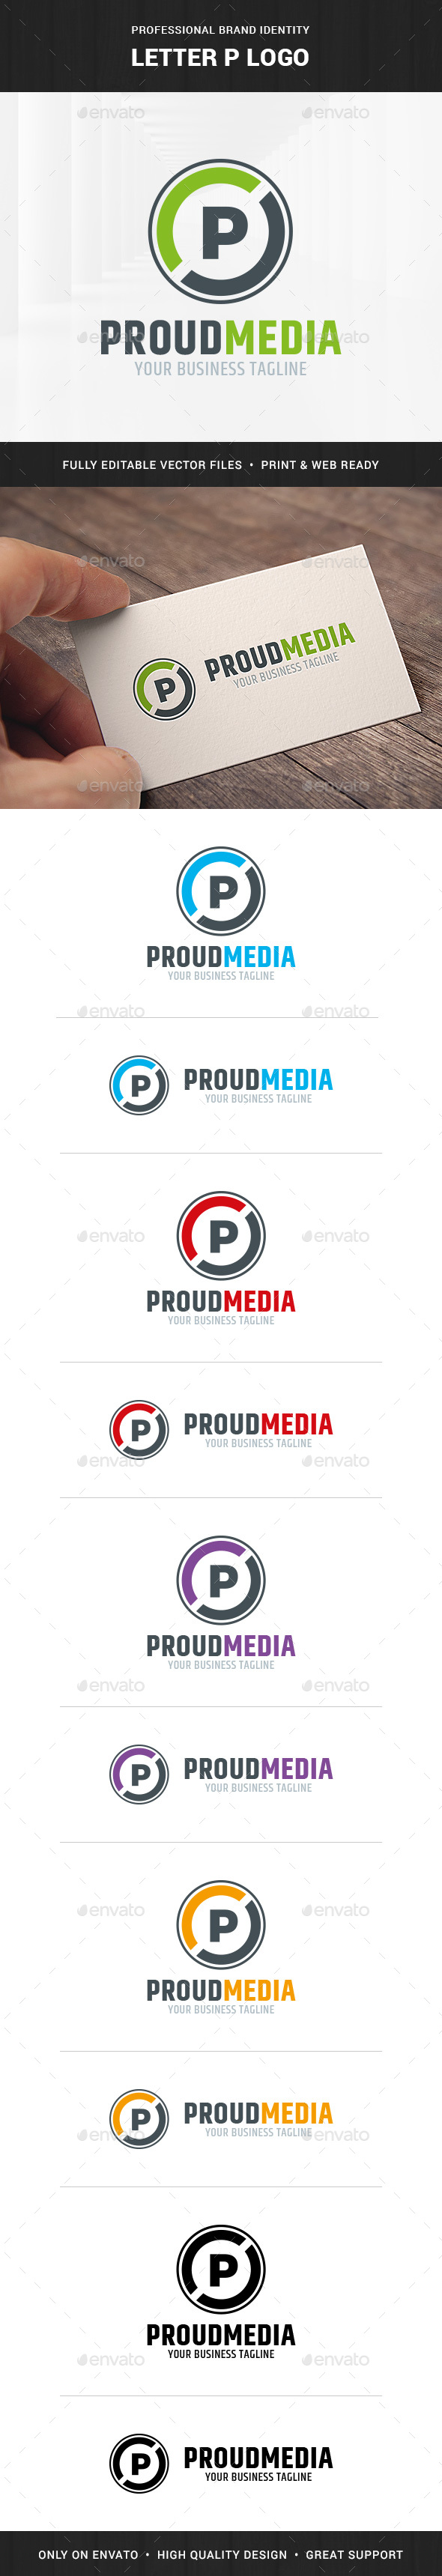 Letter P Logo Template - Letters Logo Templates